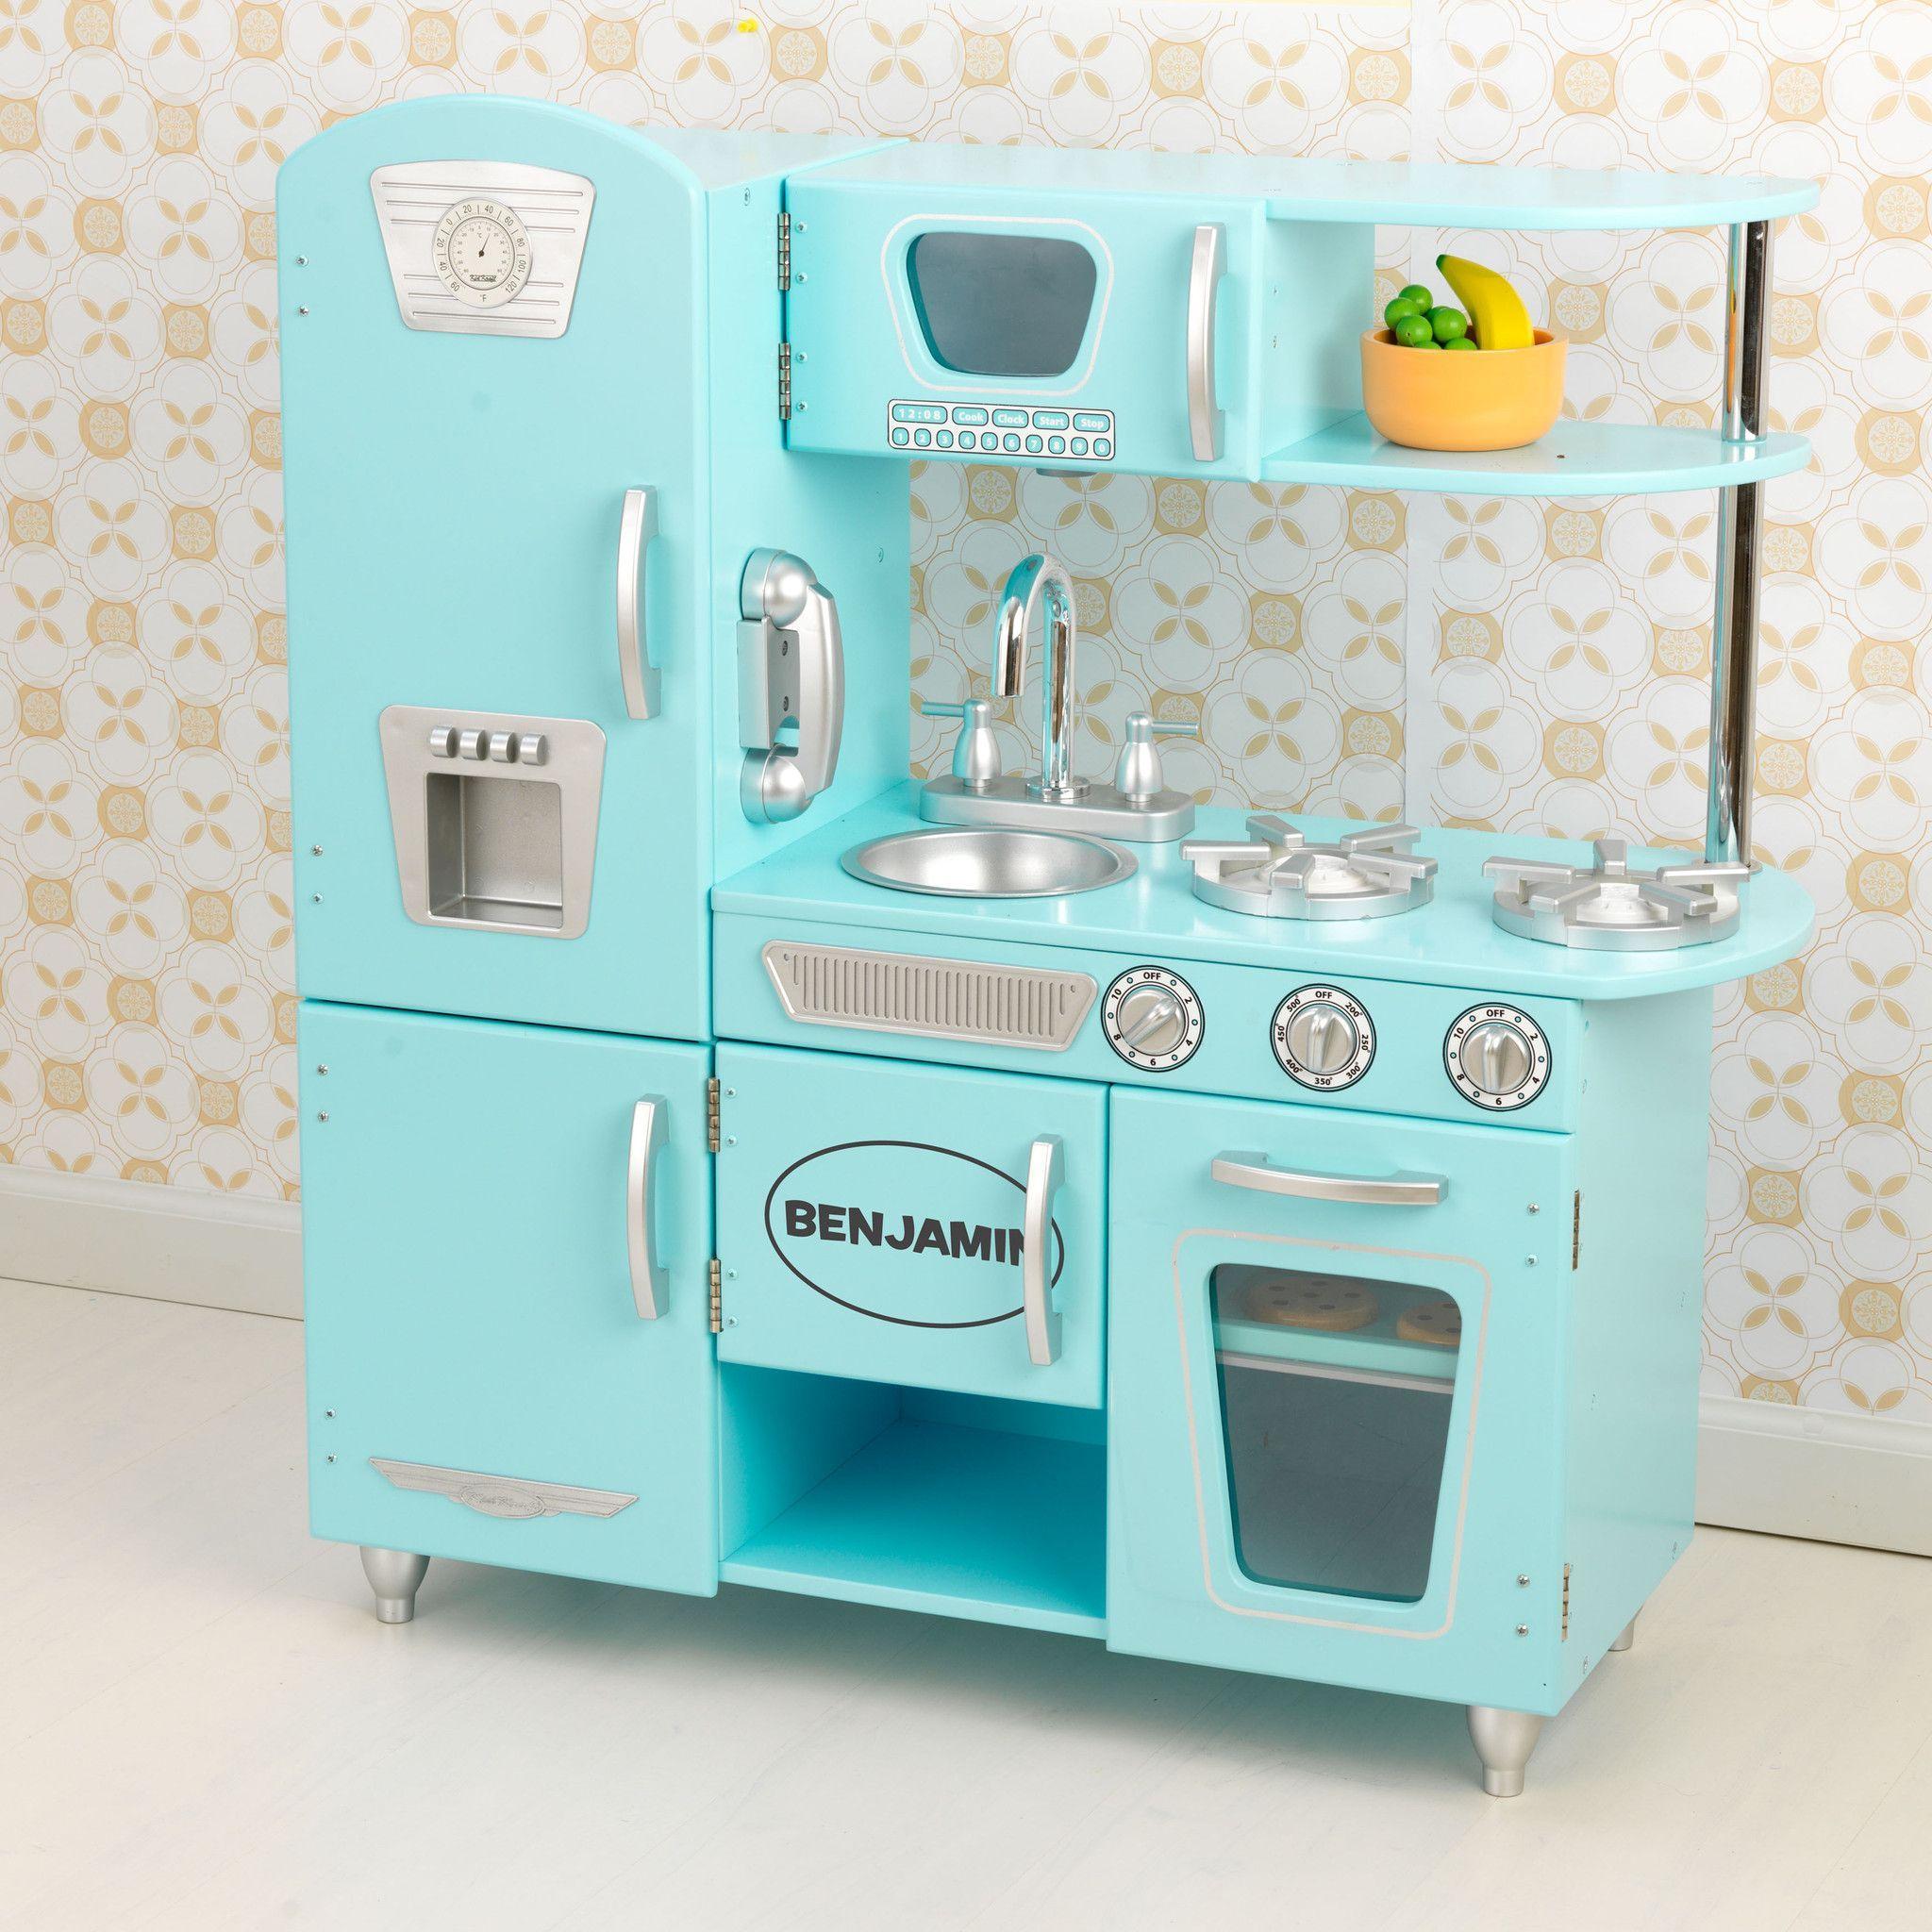 Kid Kraft Blue Vintage Kitchen - 53227 | KidKraft Products ...